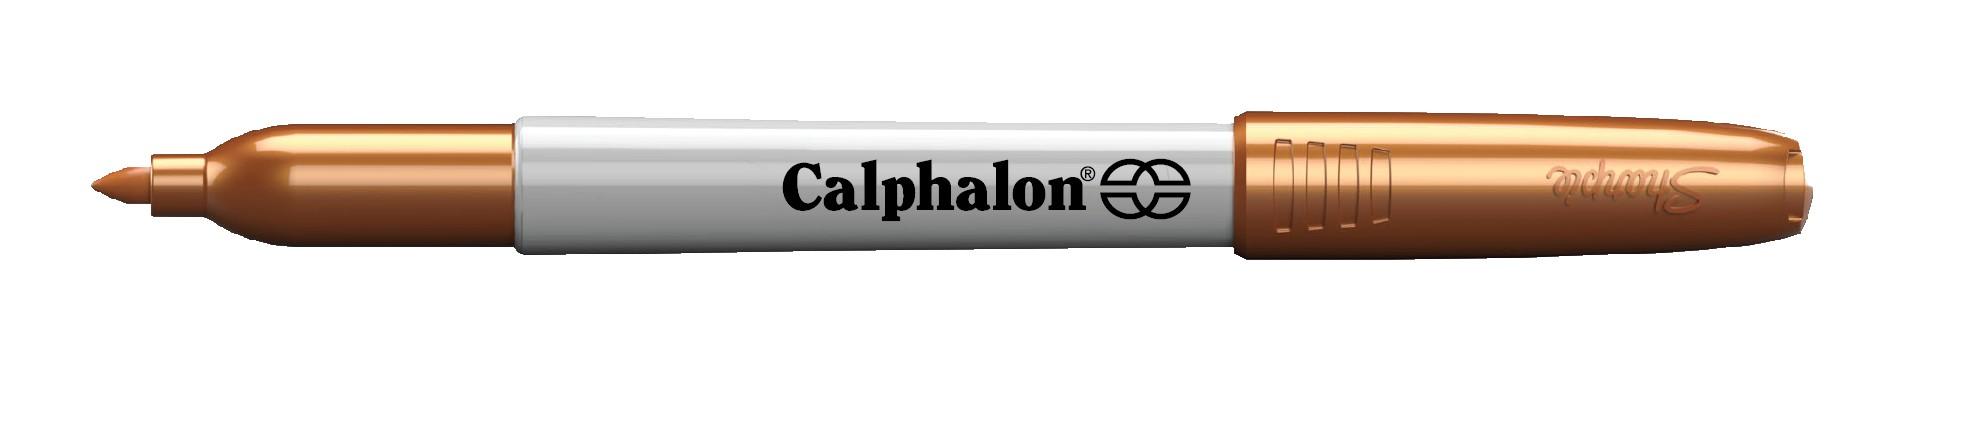 784462429-164 - Sharpie® Fine Point Metallic Permanent Marker - thumbnail